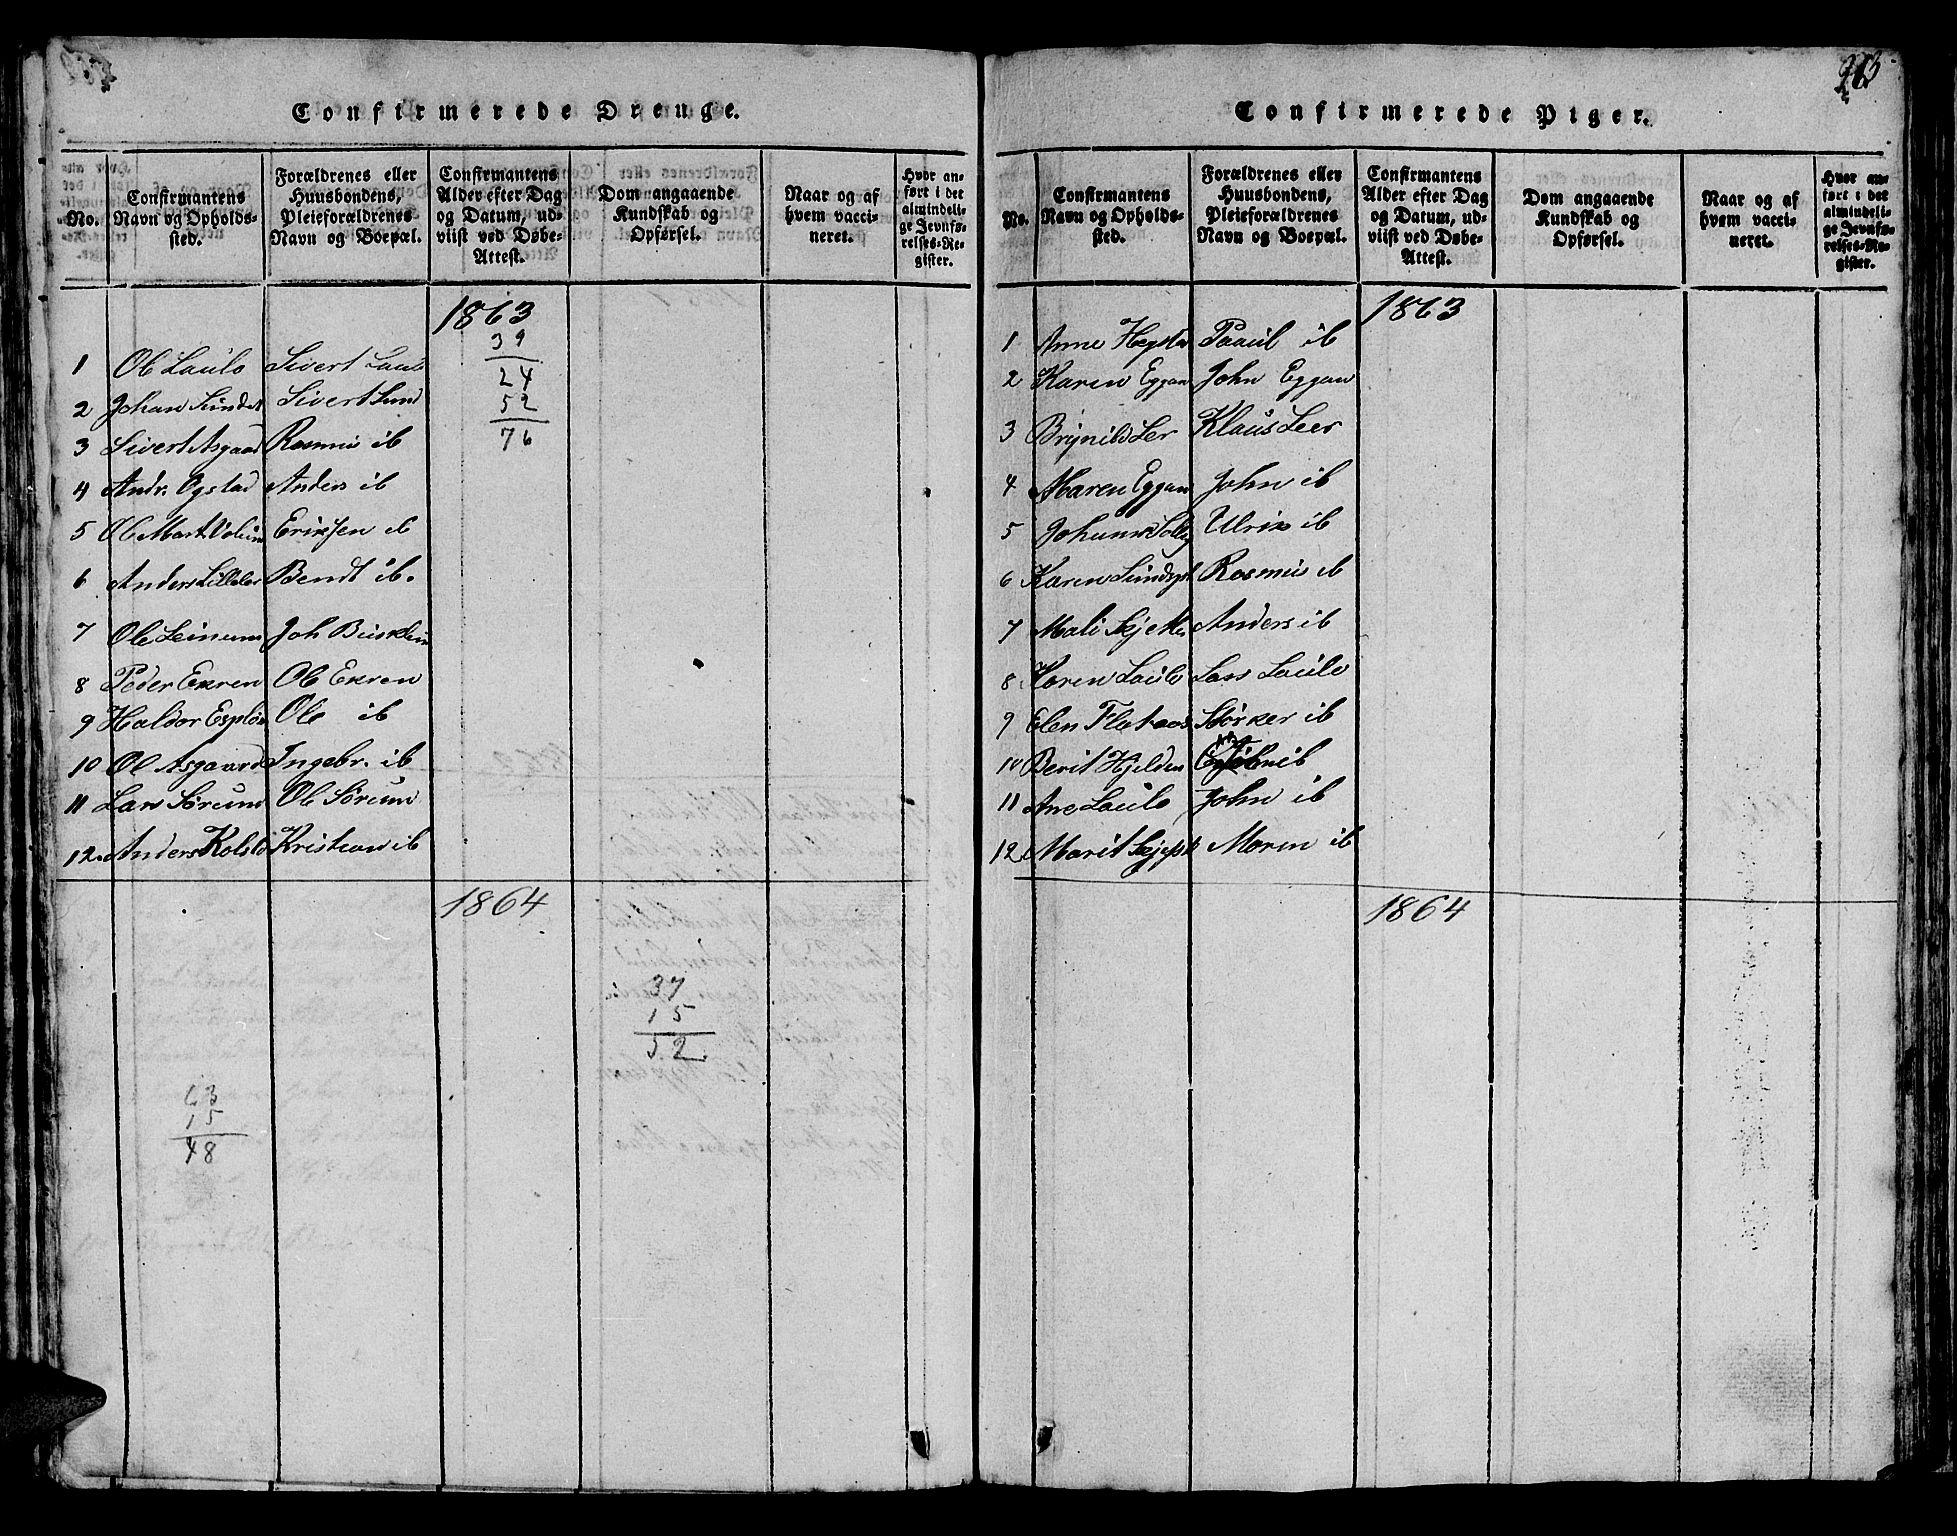 SAT, Ministerialprotokoller, klokkerbøker og fødselsregistre - Sør-Trøndelag, 613/L0393: Parish register (copy) no. 613C01, 1816-1886, p. 263